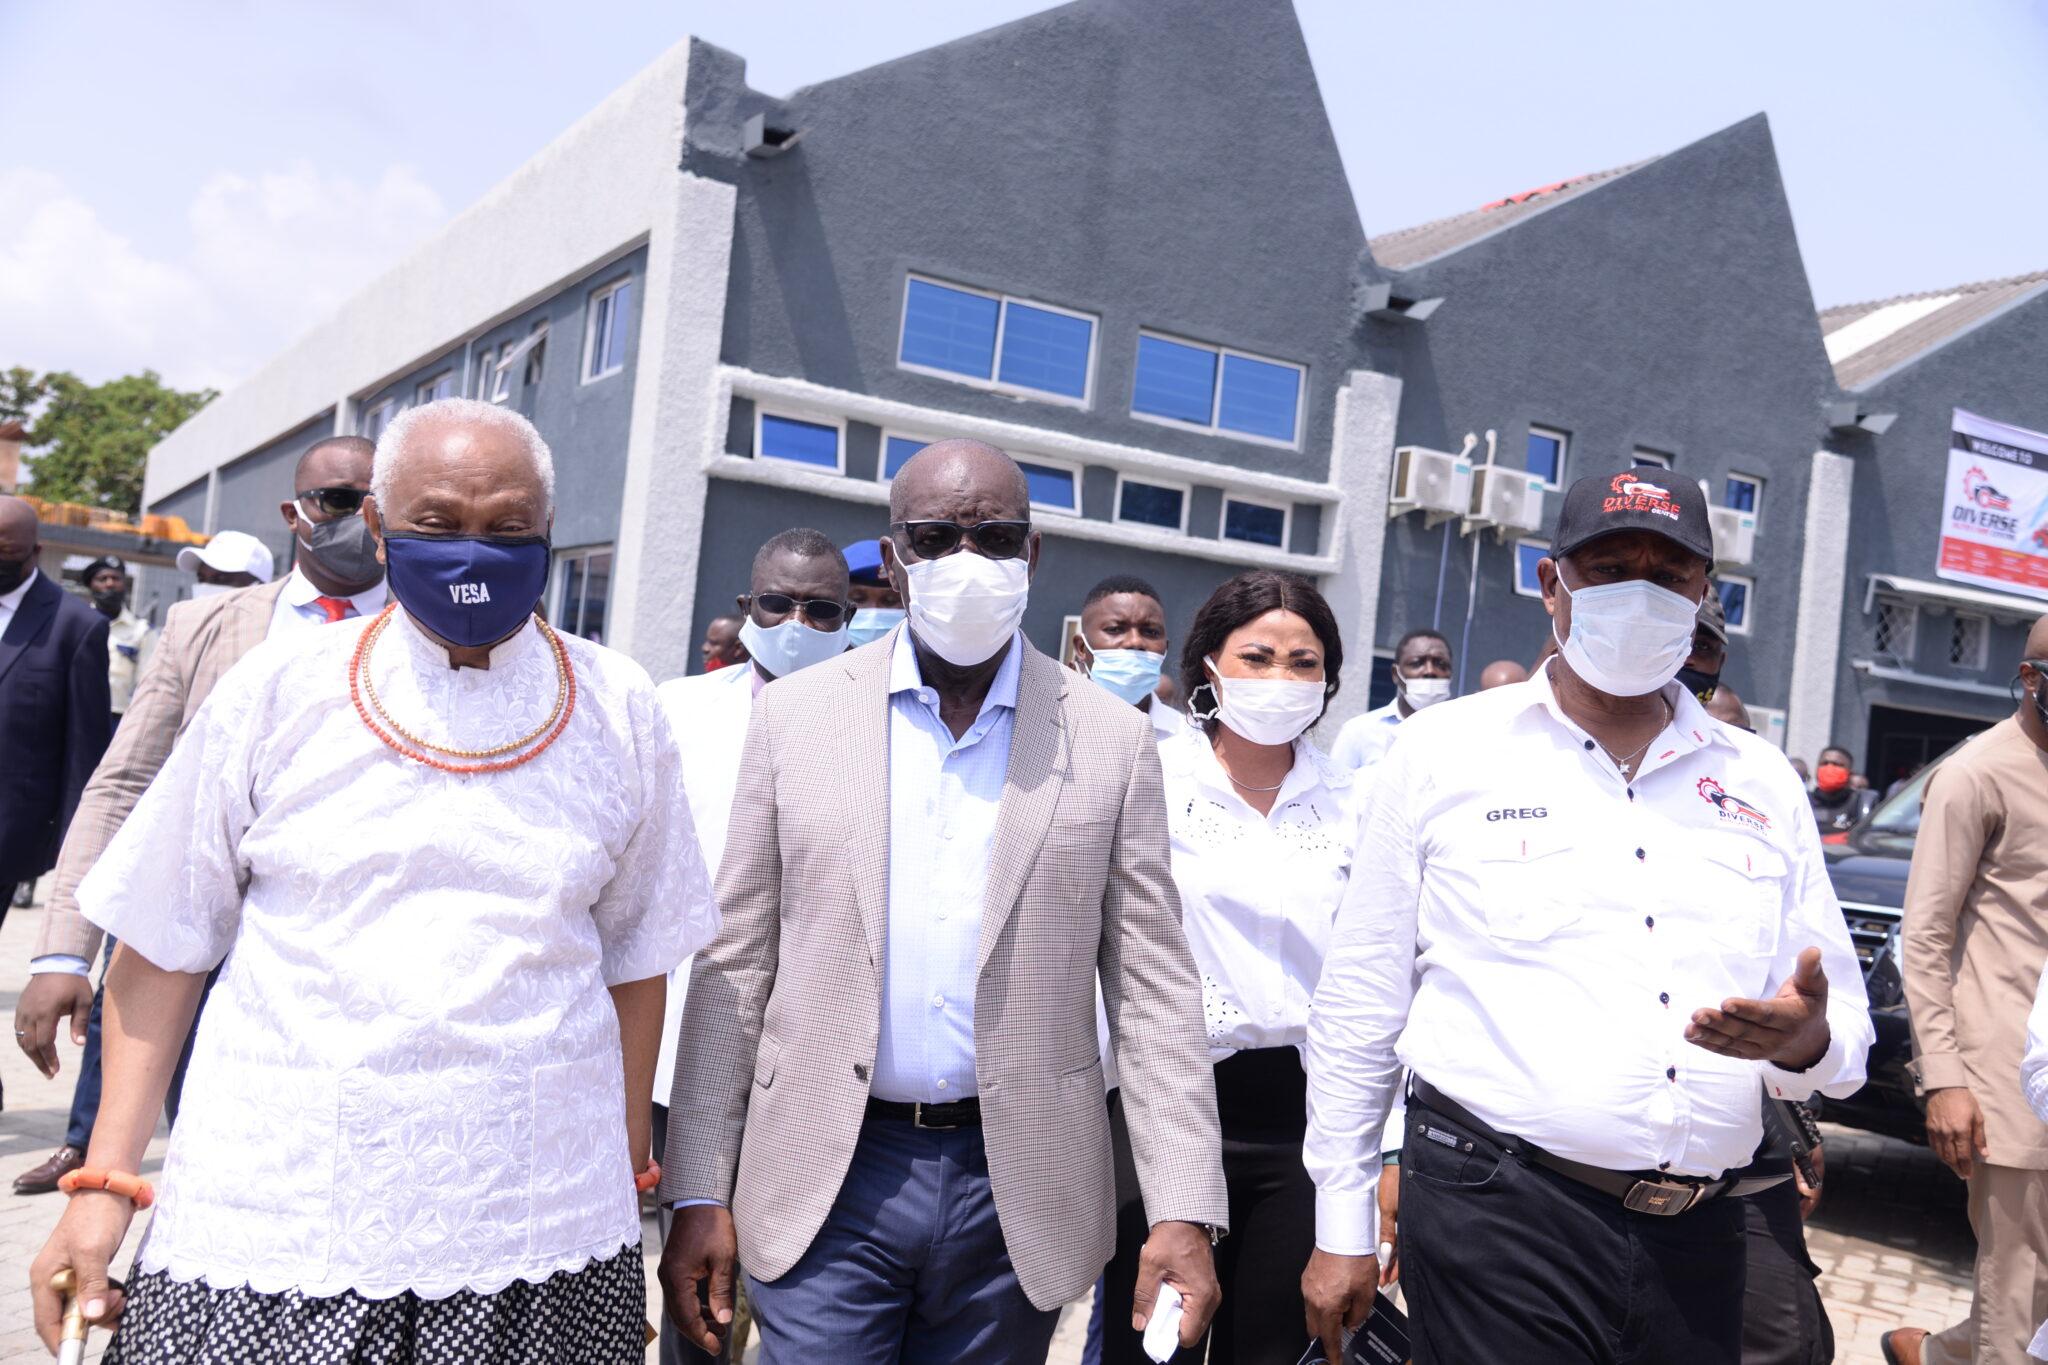 Business File: Edo State Govt Inaugurates Autocare Centre - Arbiterz